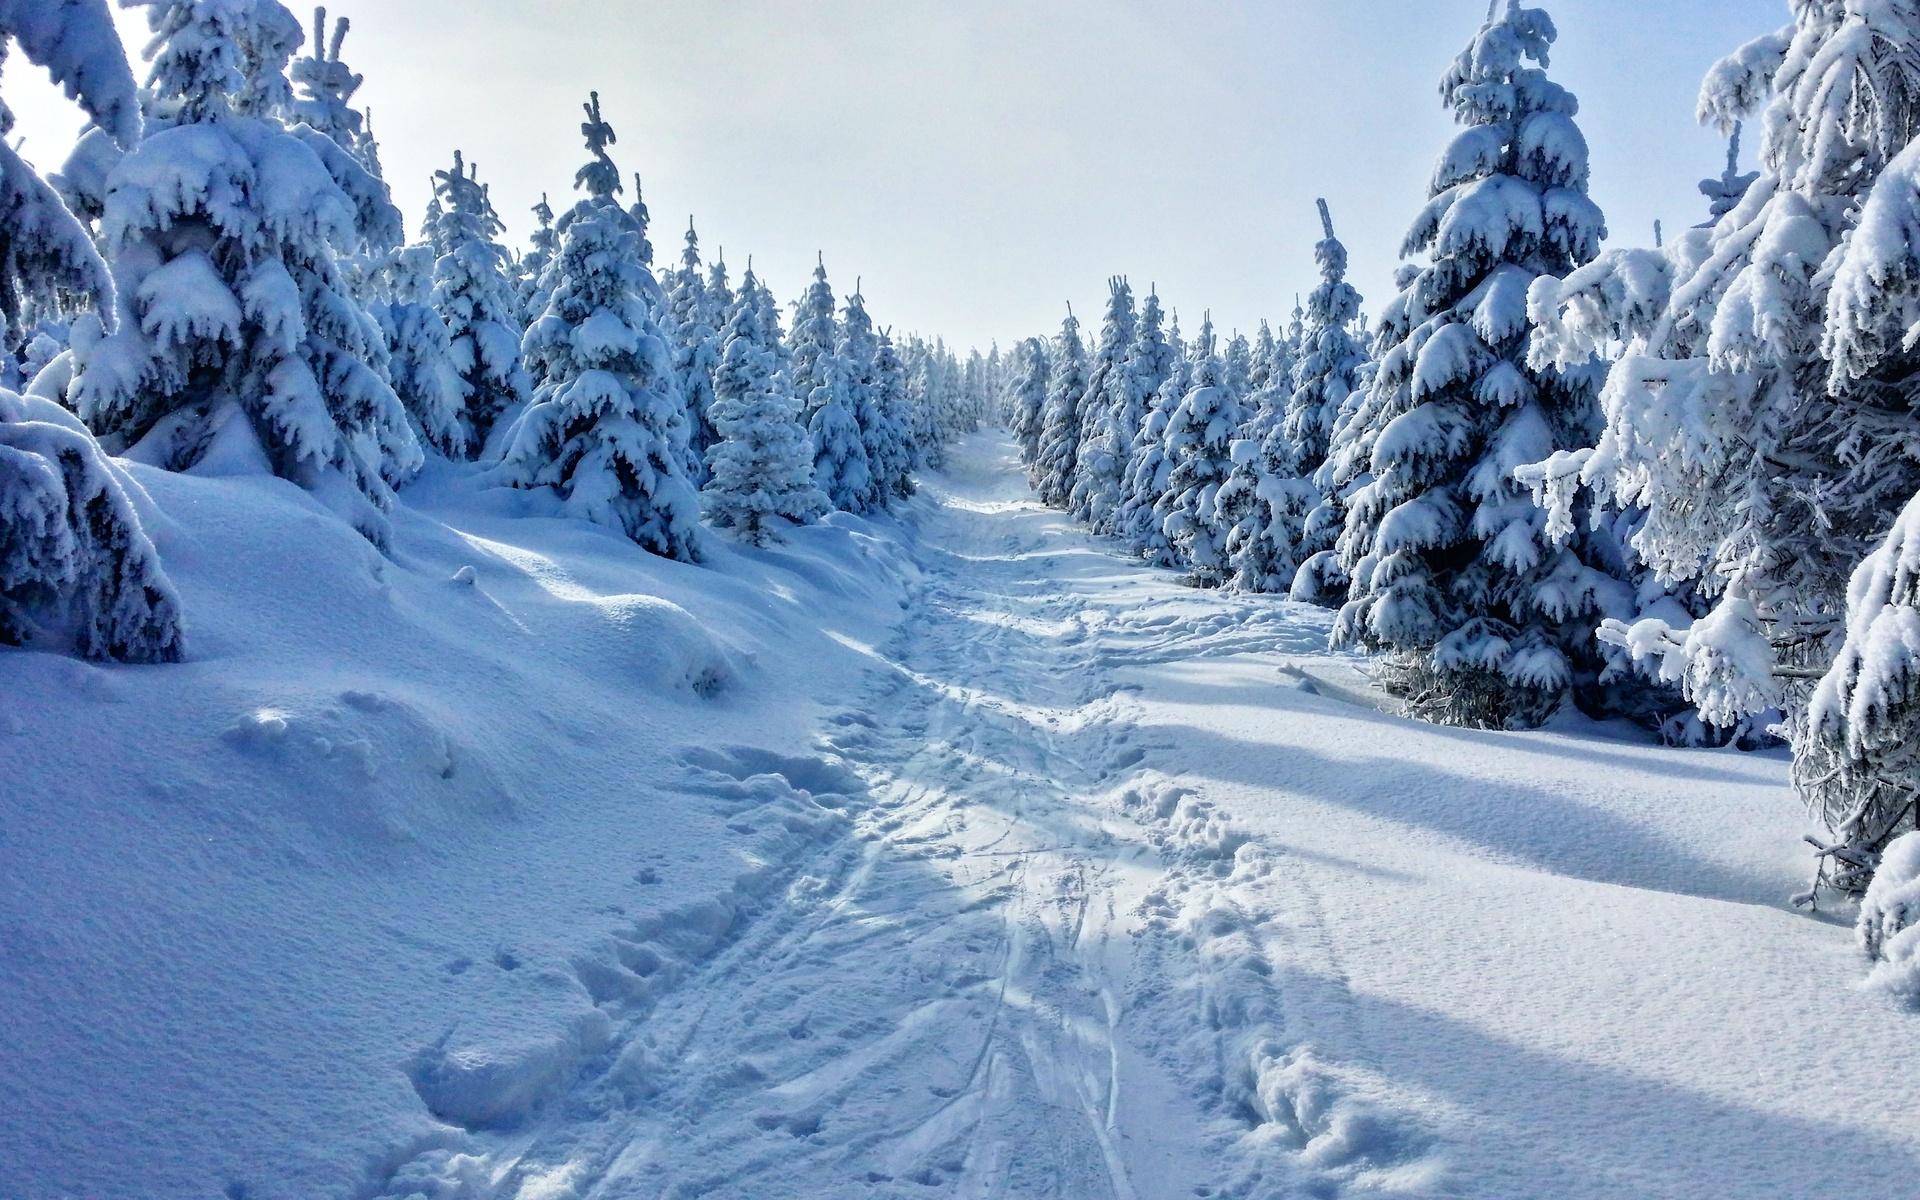 природа, пейзаж, зима, деревья, ели, снег, дорога